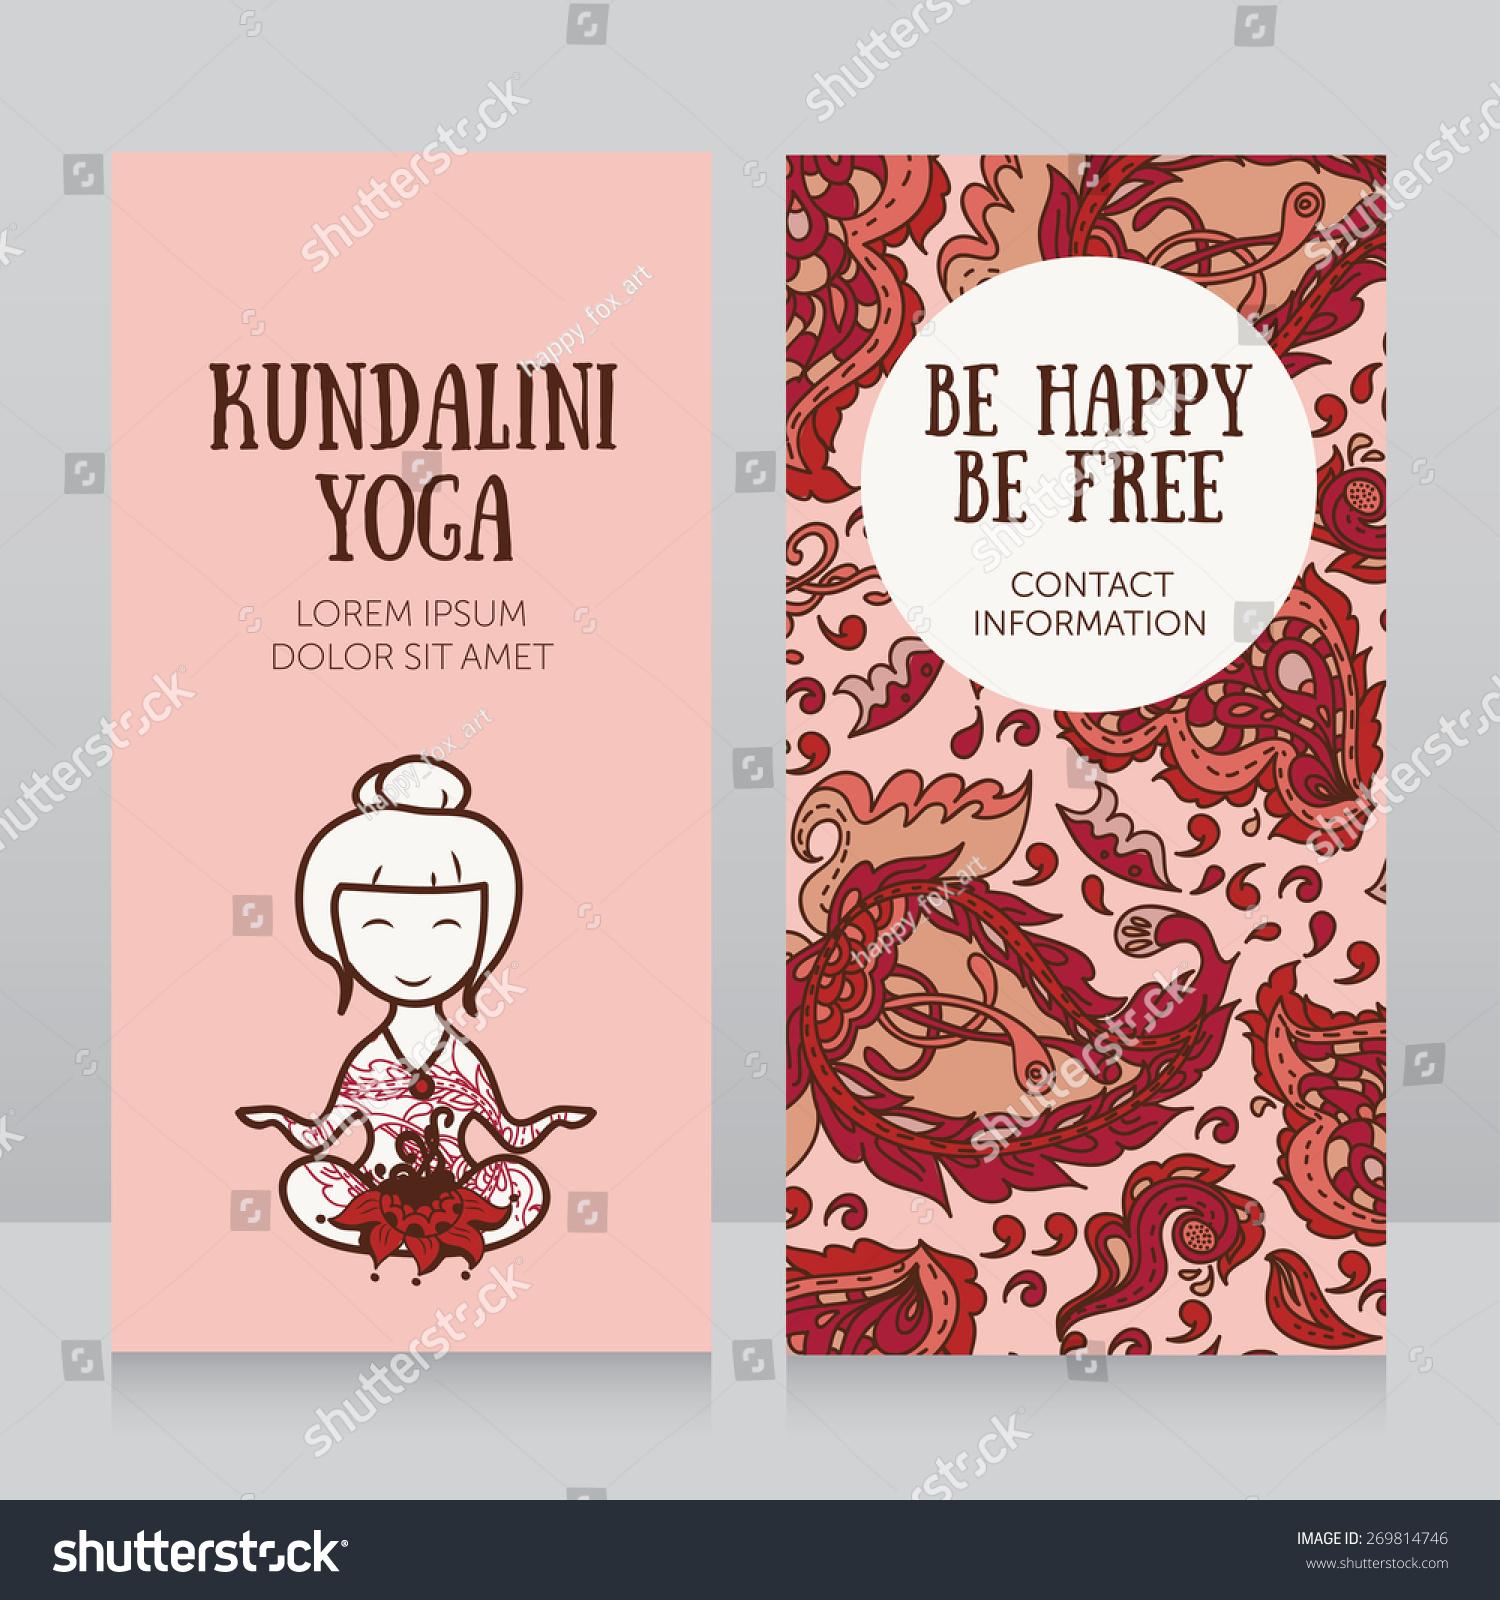 Template kundalini yoga studio business card stock vector template for kundalini yoga studio business card paisley design vector illustration magicingreecefo Images